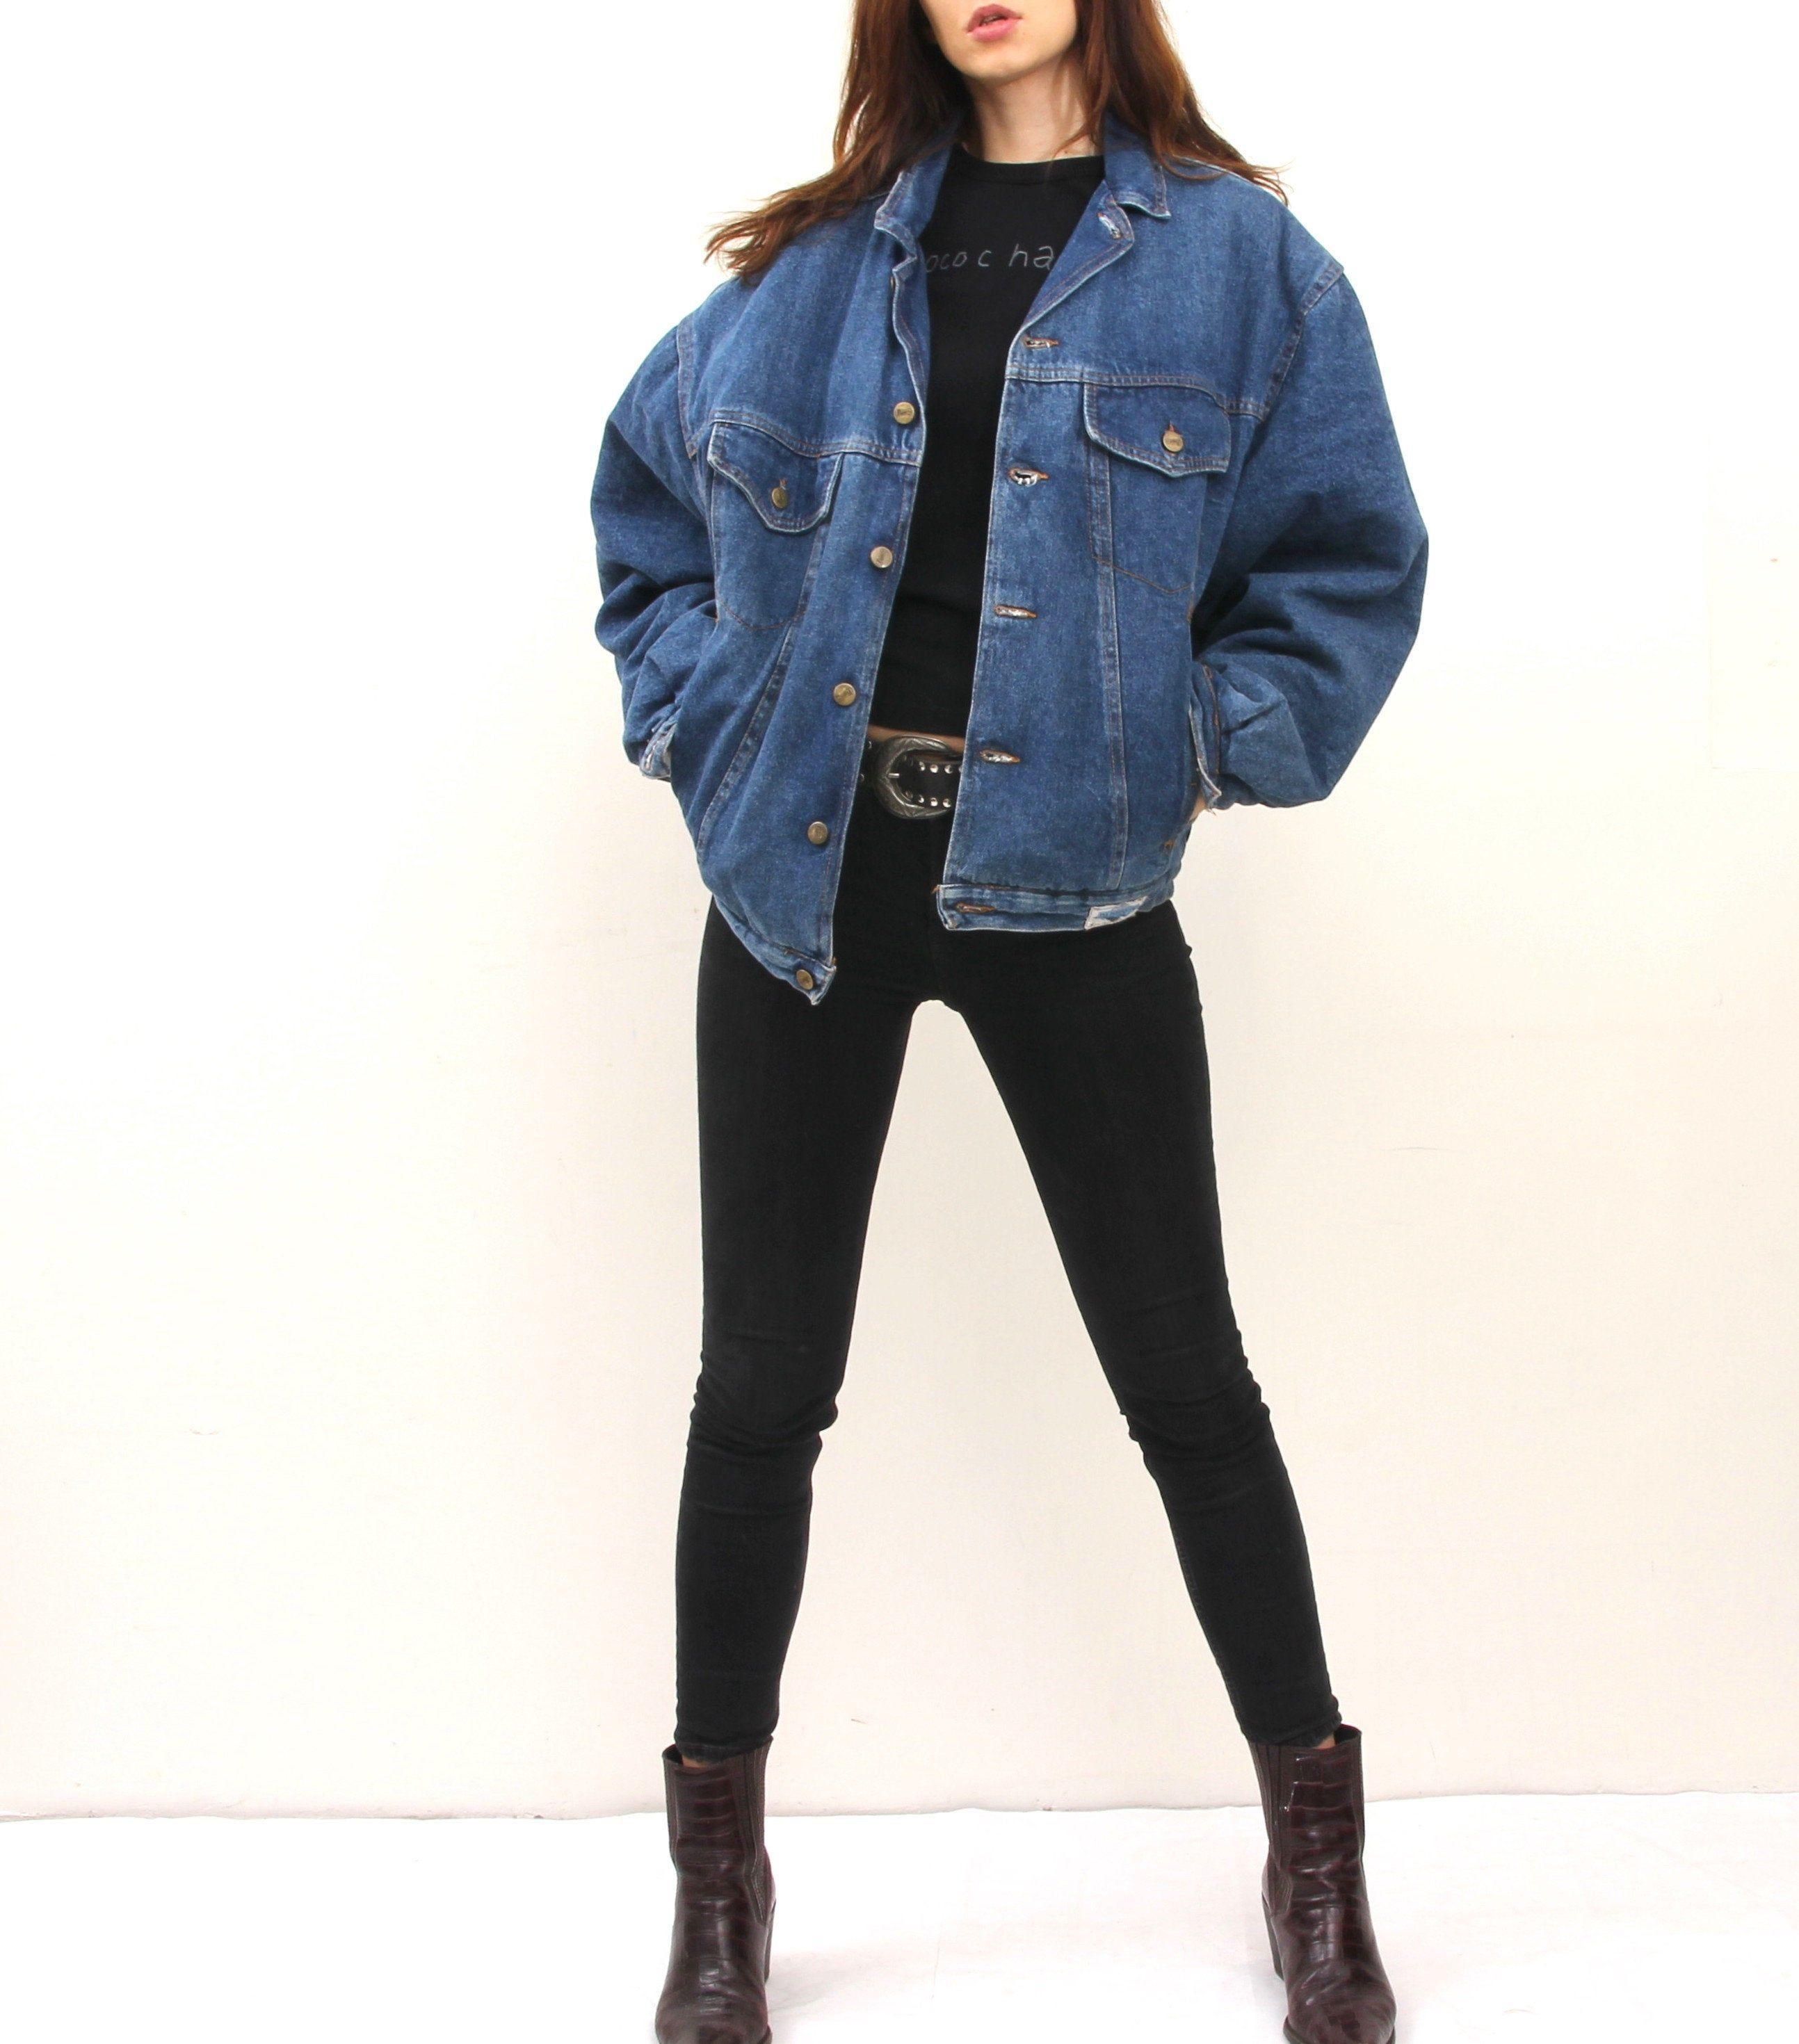 Warmed Denim Jacket Plaid Lined Jean Jacket Large Oversized Jeans Jacket L Vintage Jack In 2020 Oversized Denim Jacket Outfit Jean Jacket Outfits Jacket Outfit Women